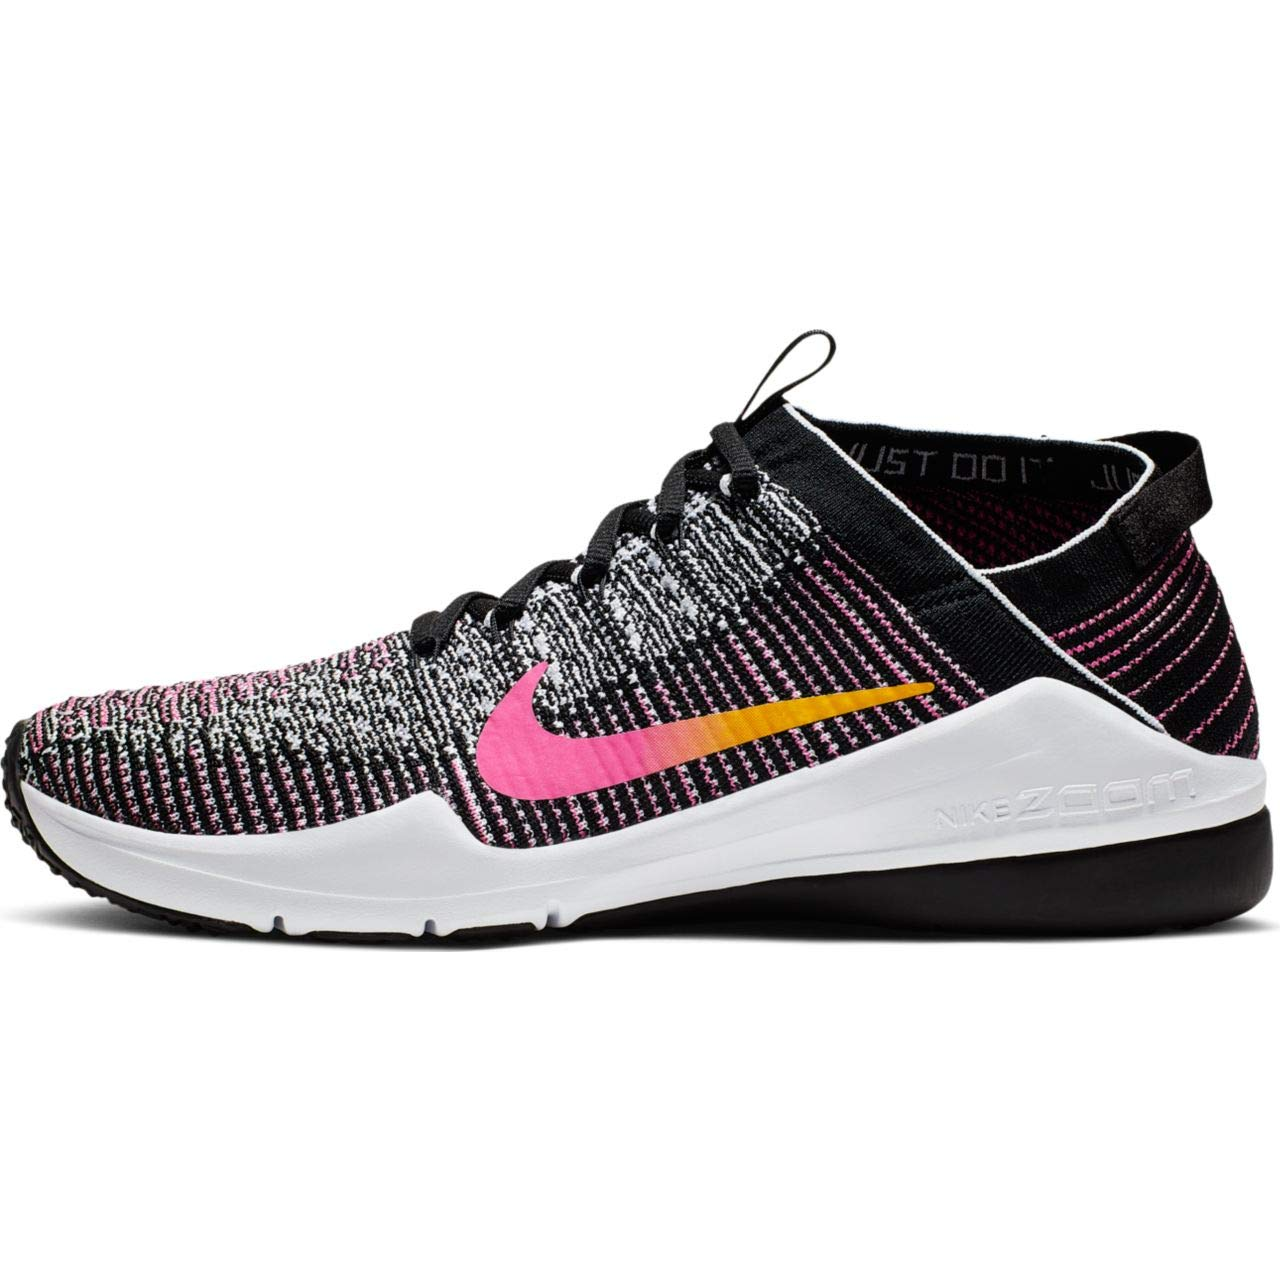 MultiCouleure (noir University or Laser Fuchsia 000) 43 EU Nike W Air Zoom Fearless FK 2, Chaussures de Fitness Femme